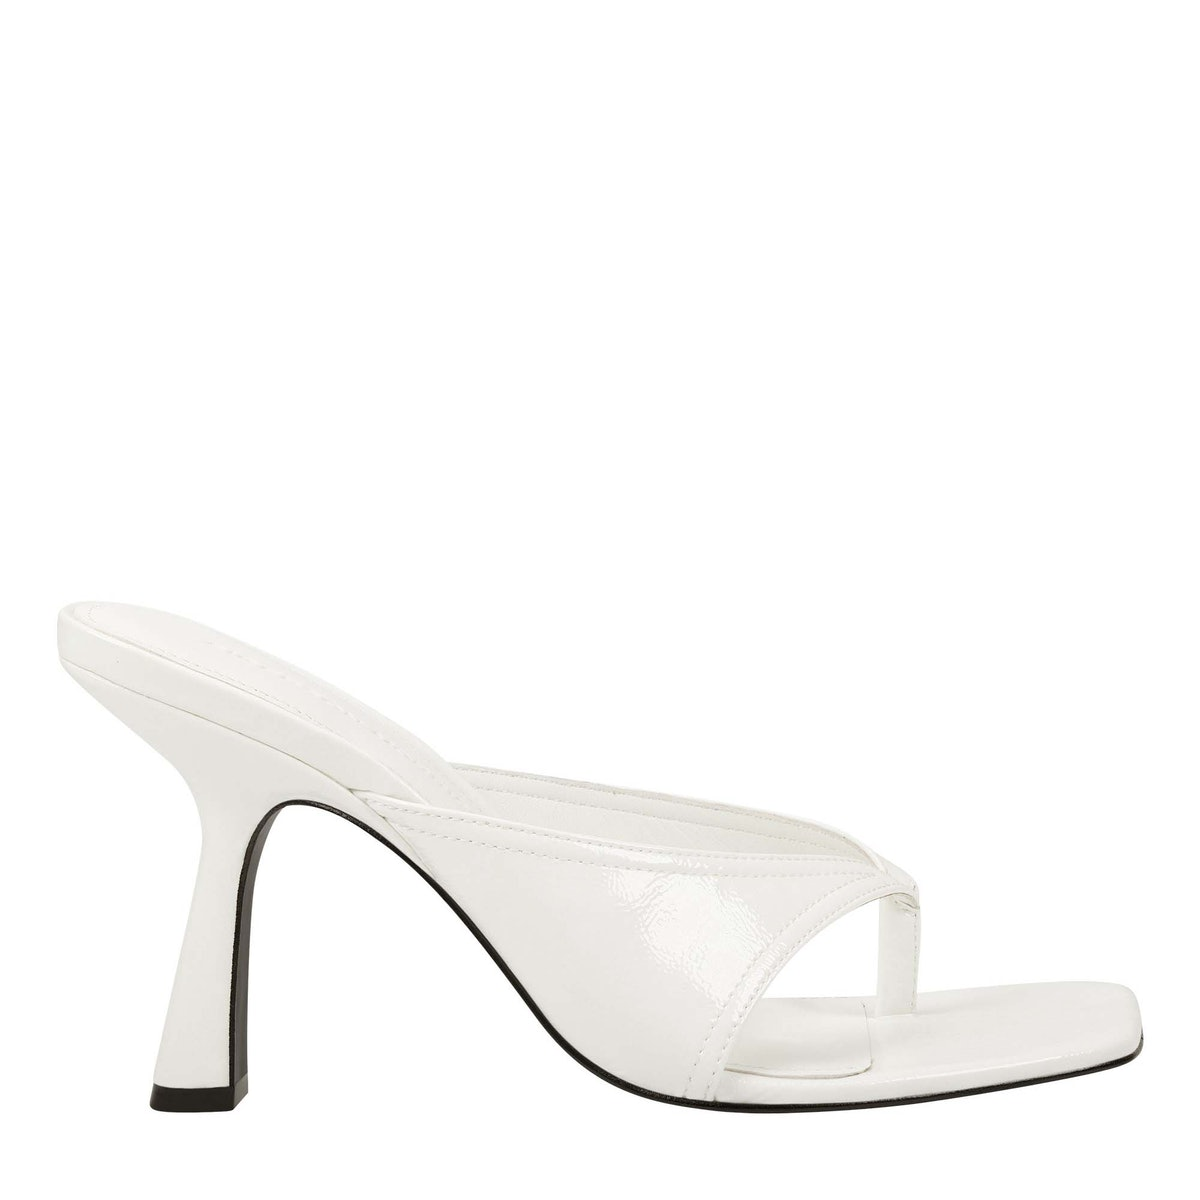 Kaliska High Heel Thong Sandal